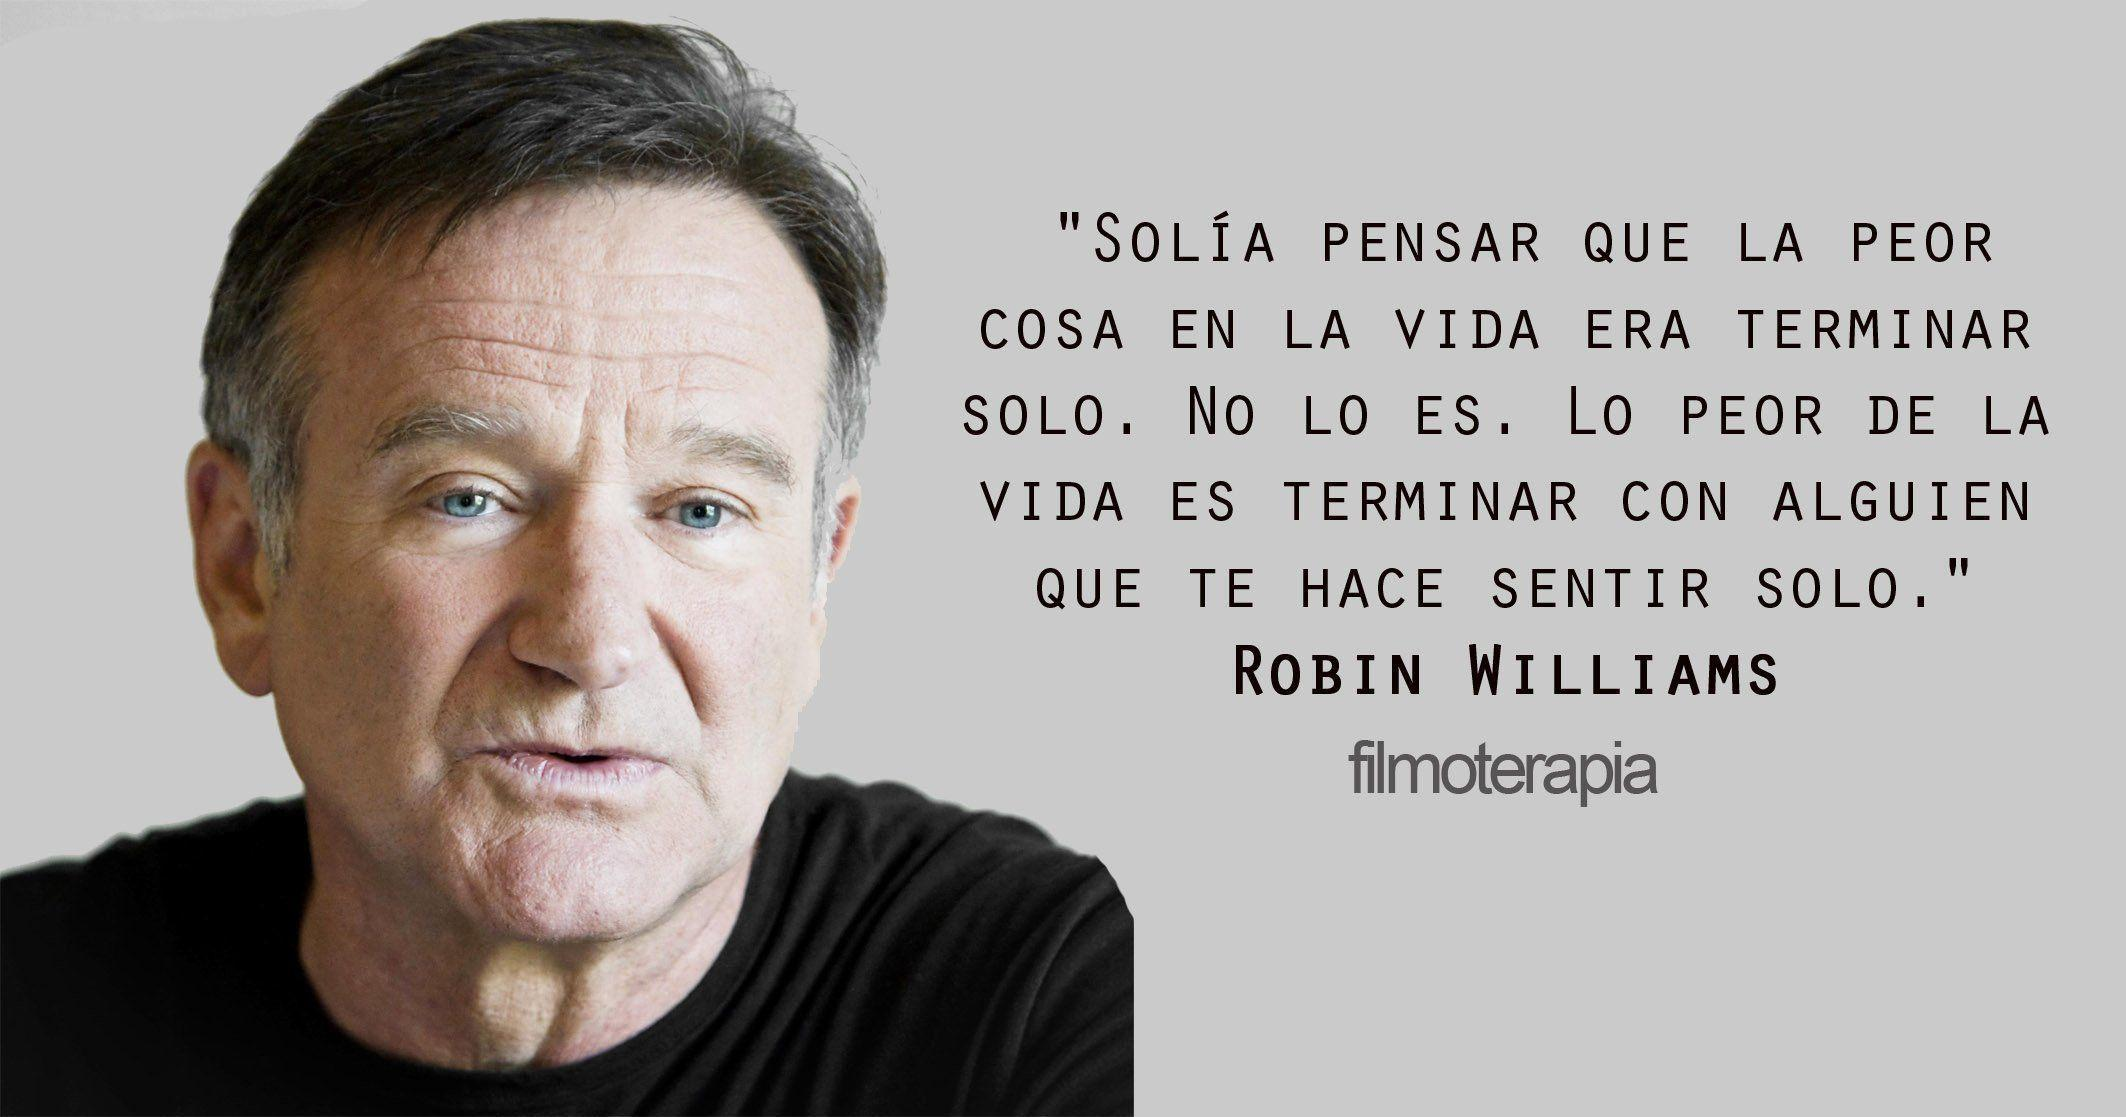 ROBIN WILLIAMS comedy comedian actor wallpaper | 2126x1117 ...